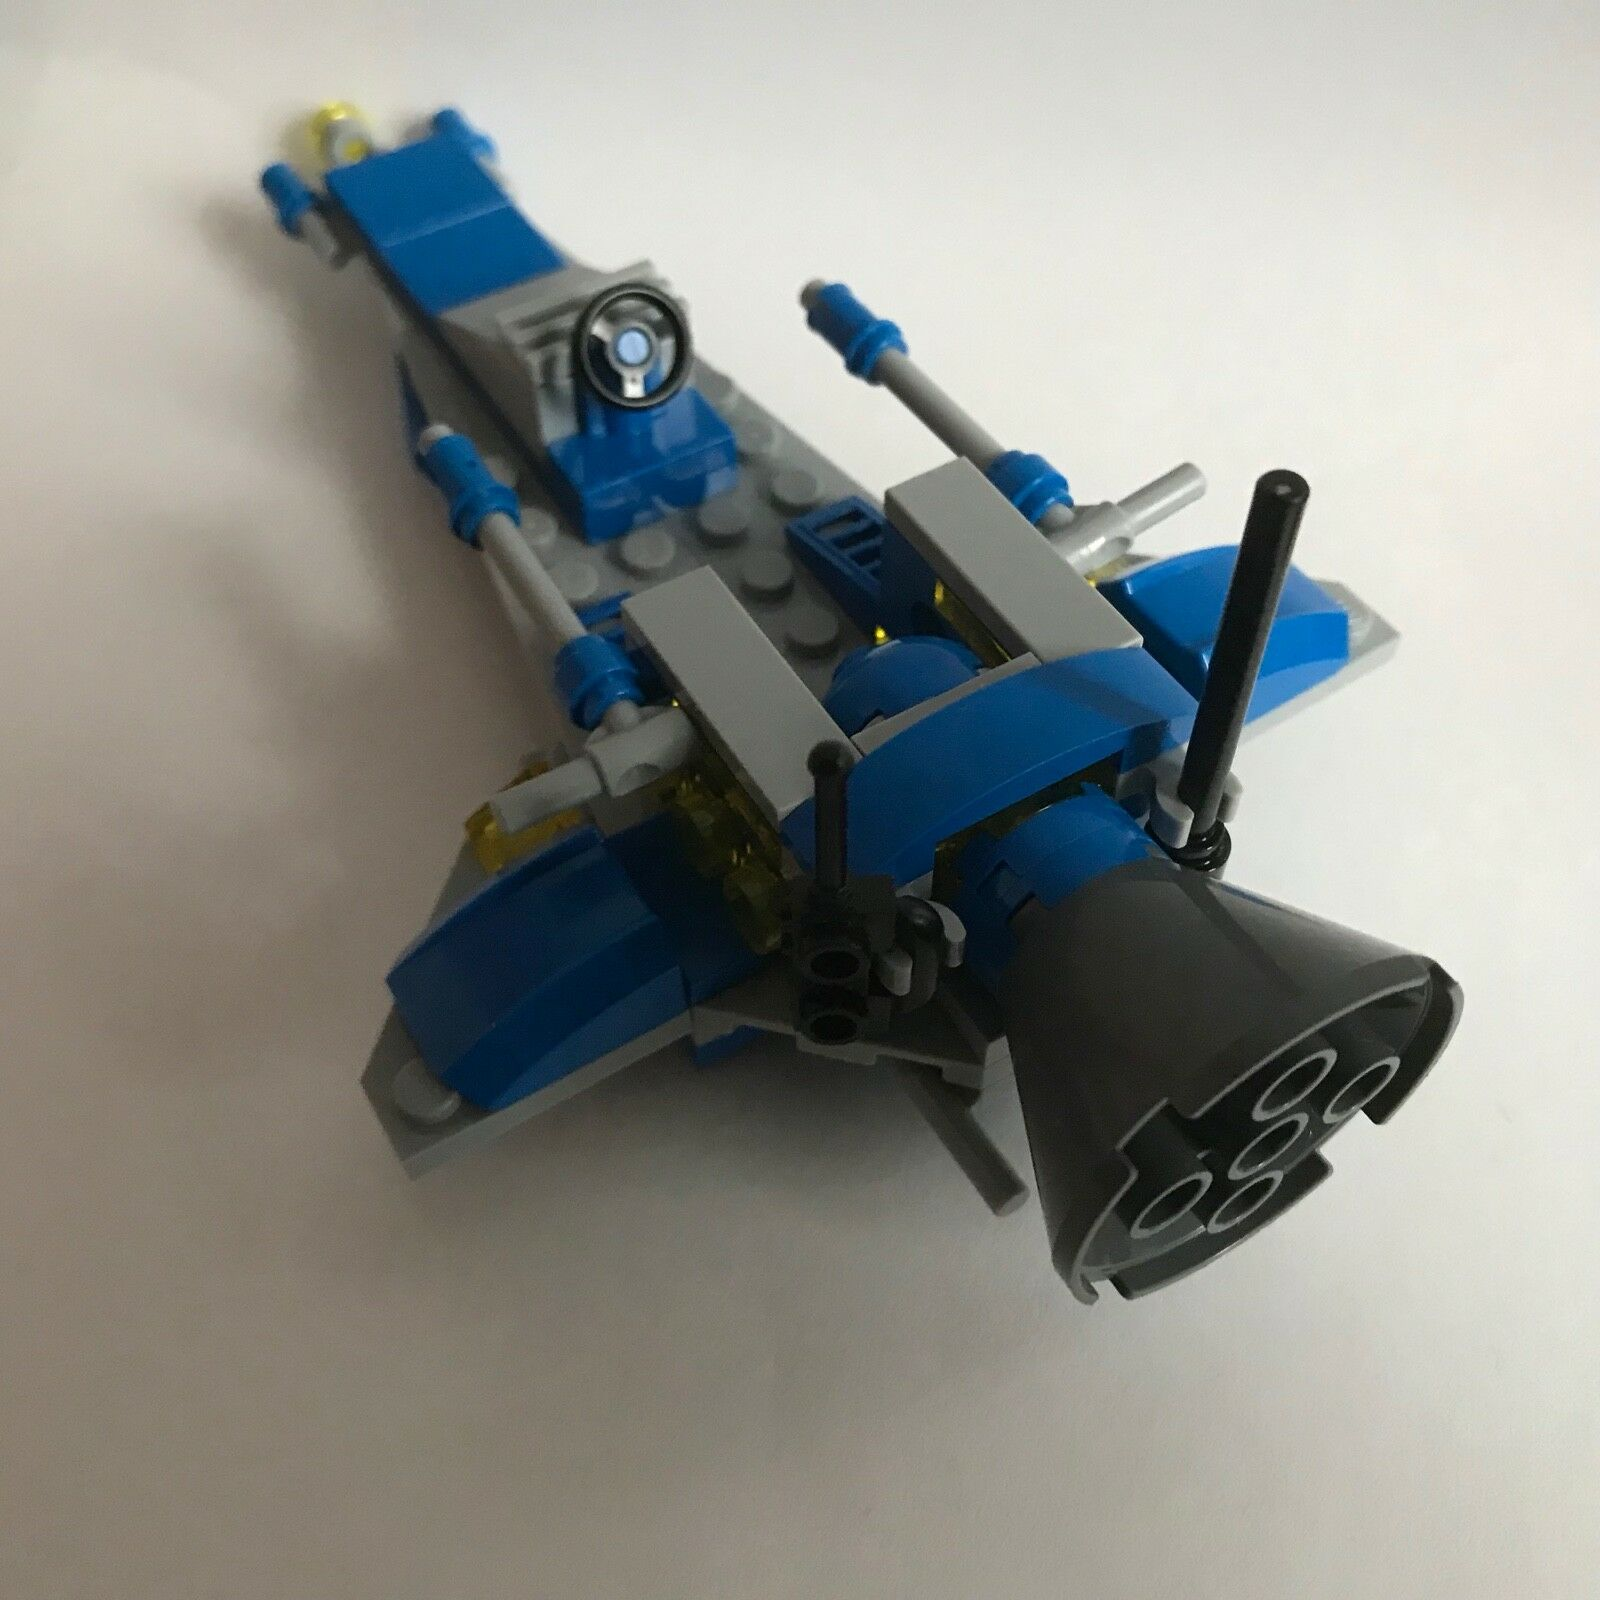 LEGO SPACE - 3 white white white SPACEMEN from 70841 + 3 x SPACESHIPS - my design 4 630dac